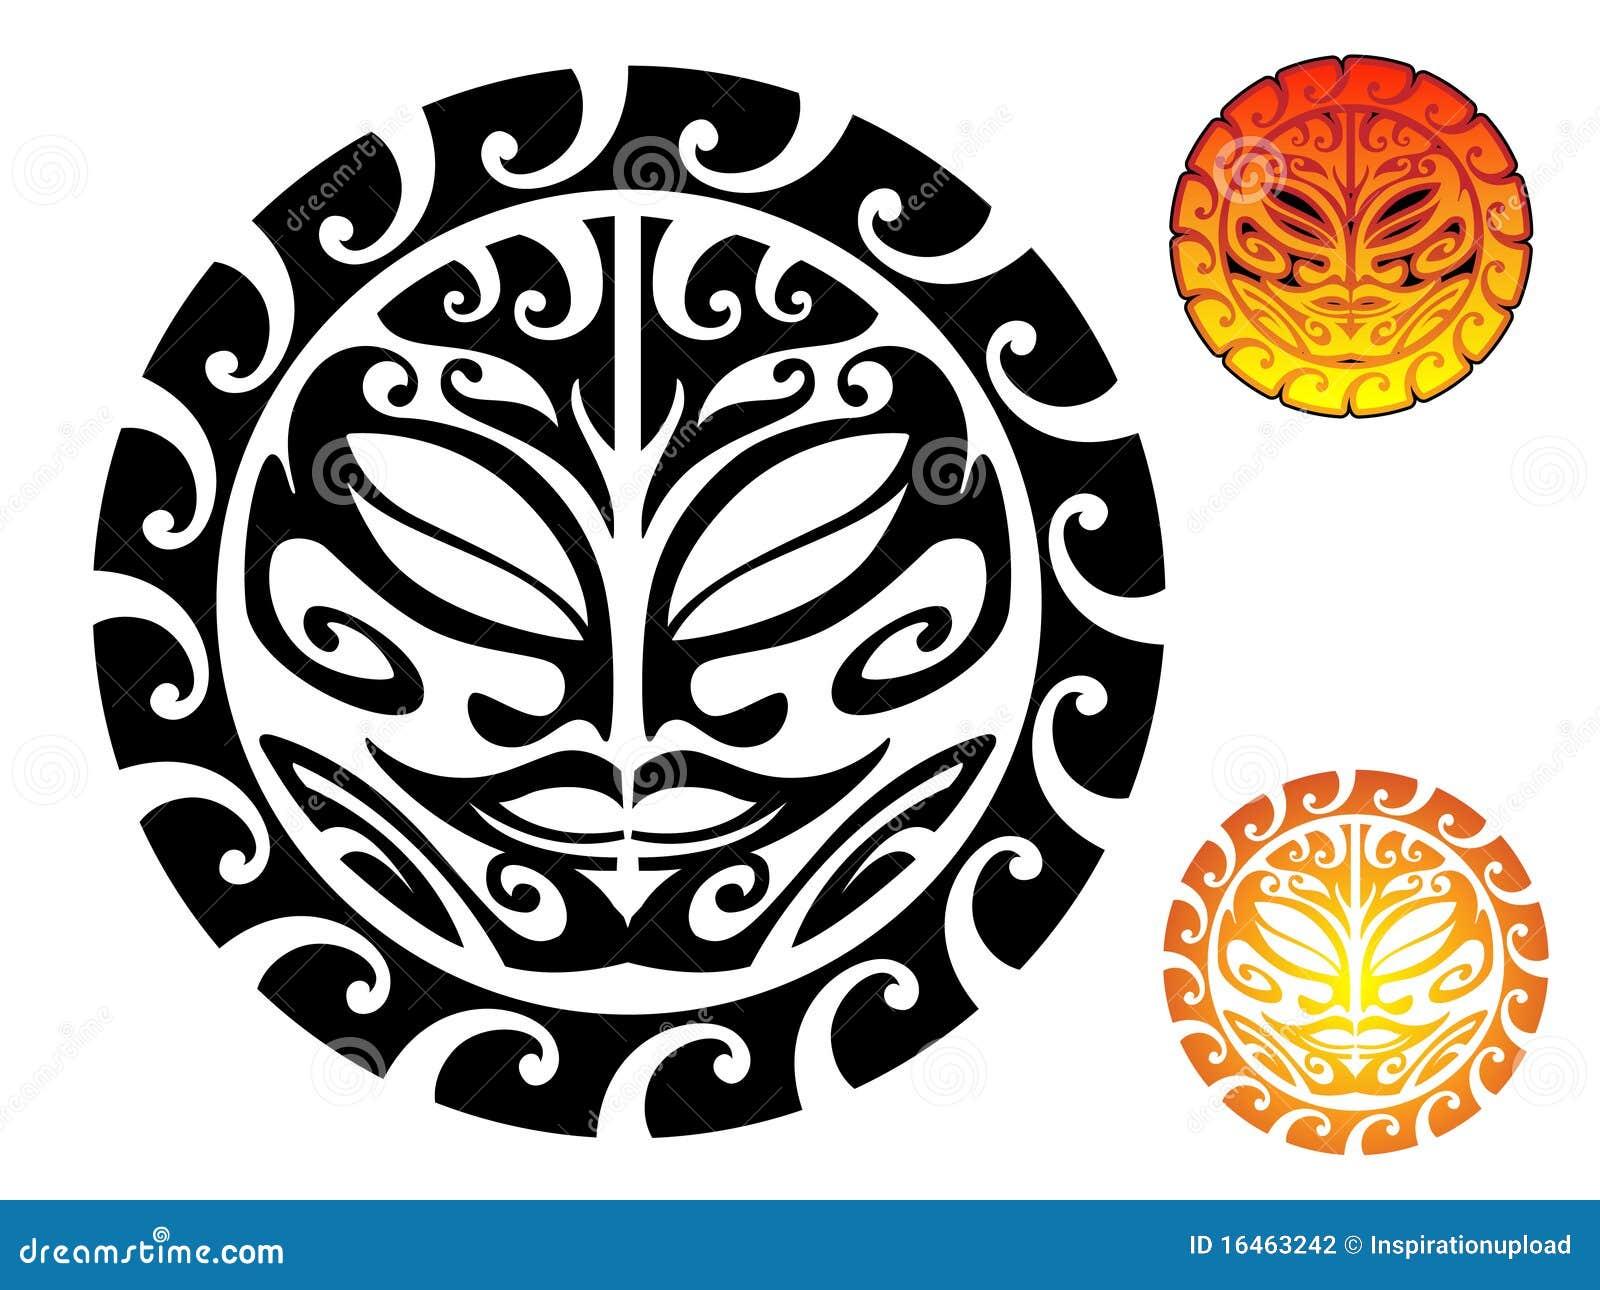 Sunrise tribal tattoo designs tribal sun - Tribal Sun Stock Photography